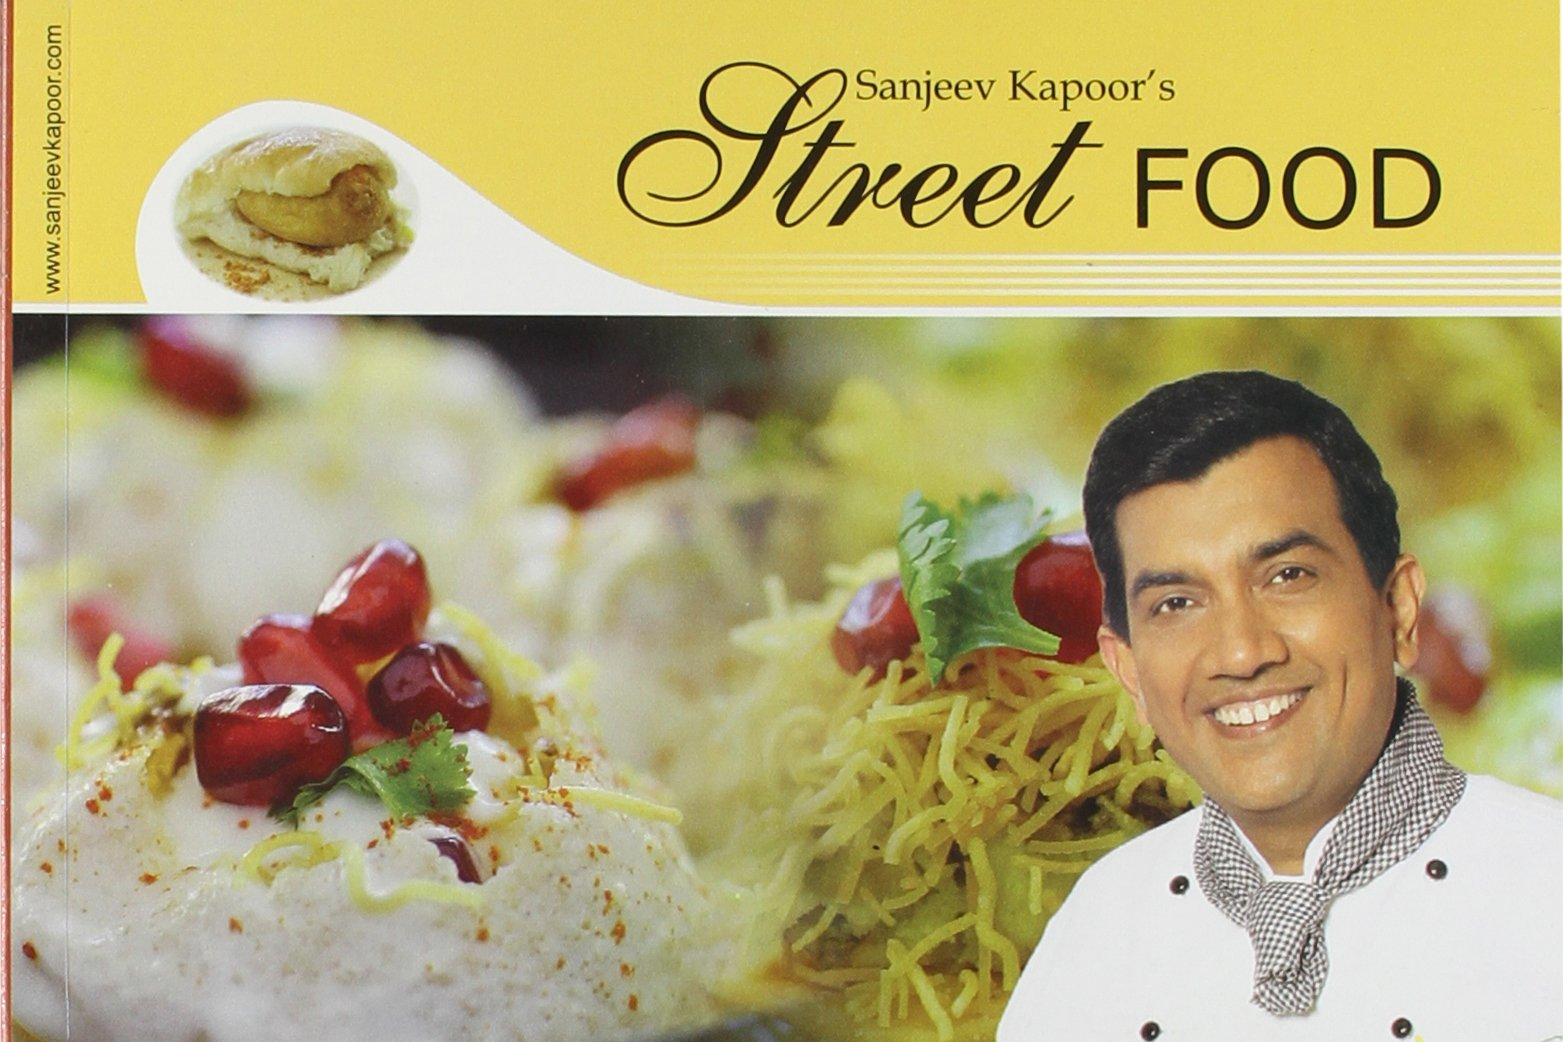 Sanjeev kapoors street food sanjeev kapoor 9788179913604 amazon sanjeev kapoors street food sanjeev kapoor 9788179913604 amazon books forumfinder Gallery